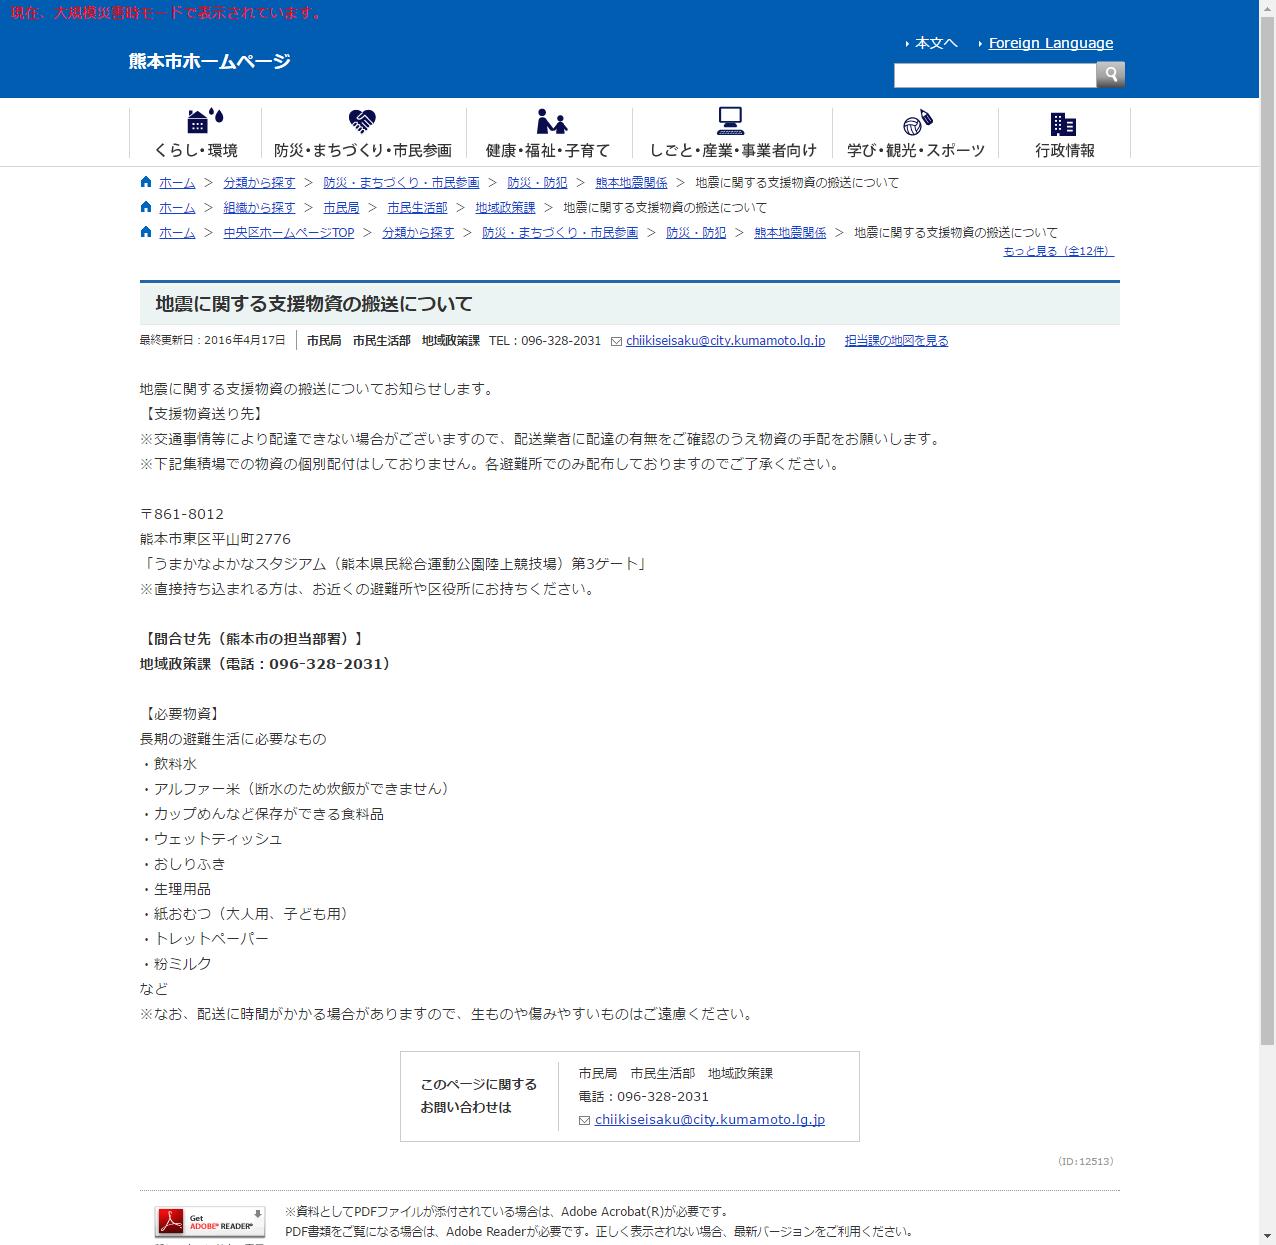 jishin-busshi-kumamoto-shi-2016-04-19